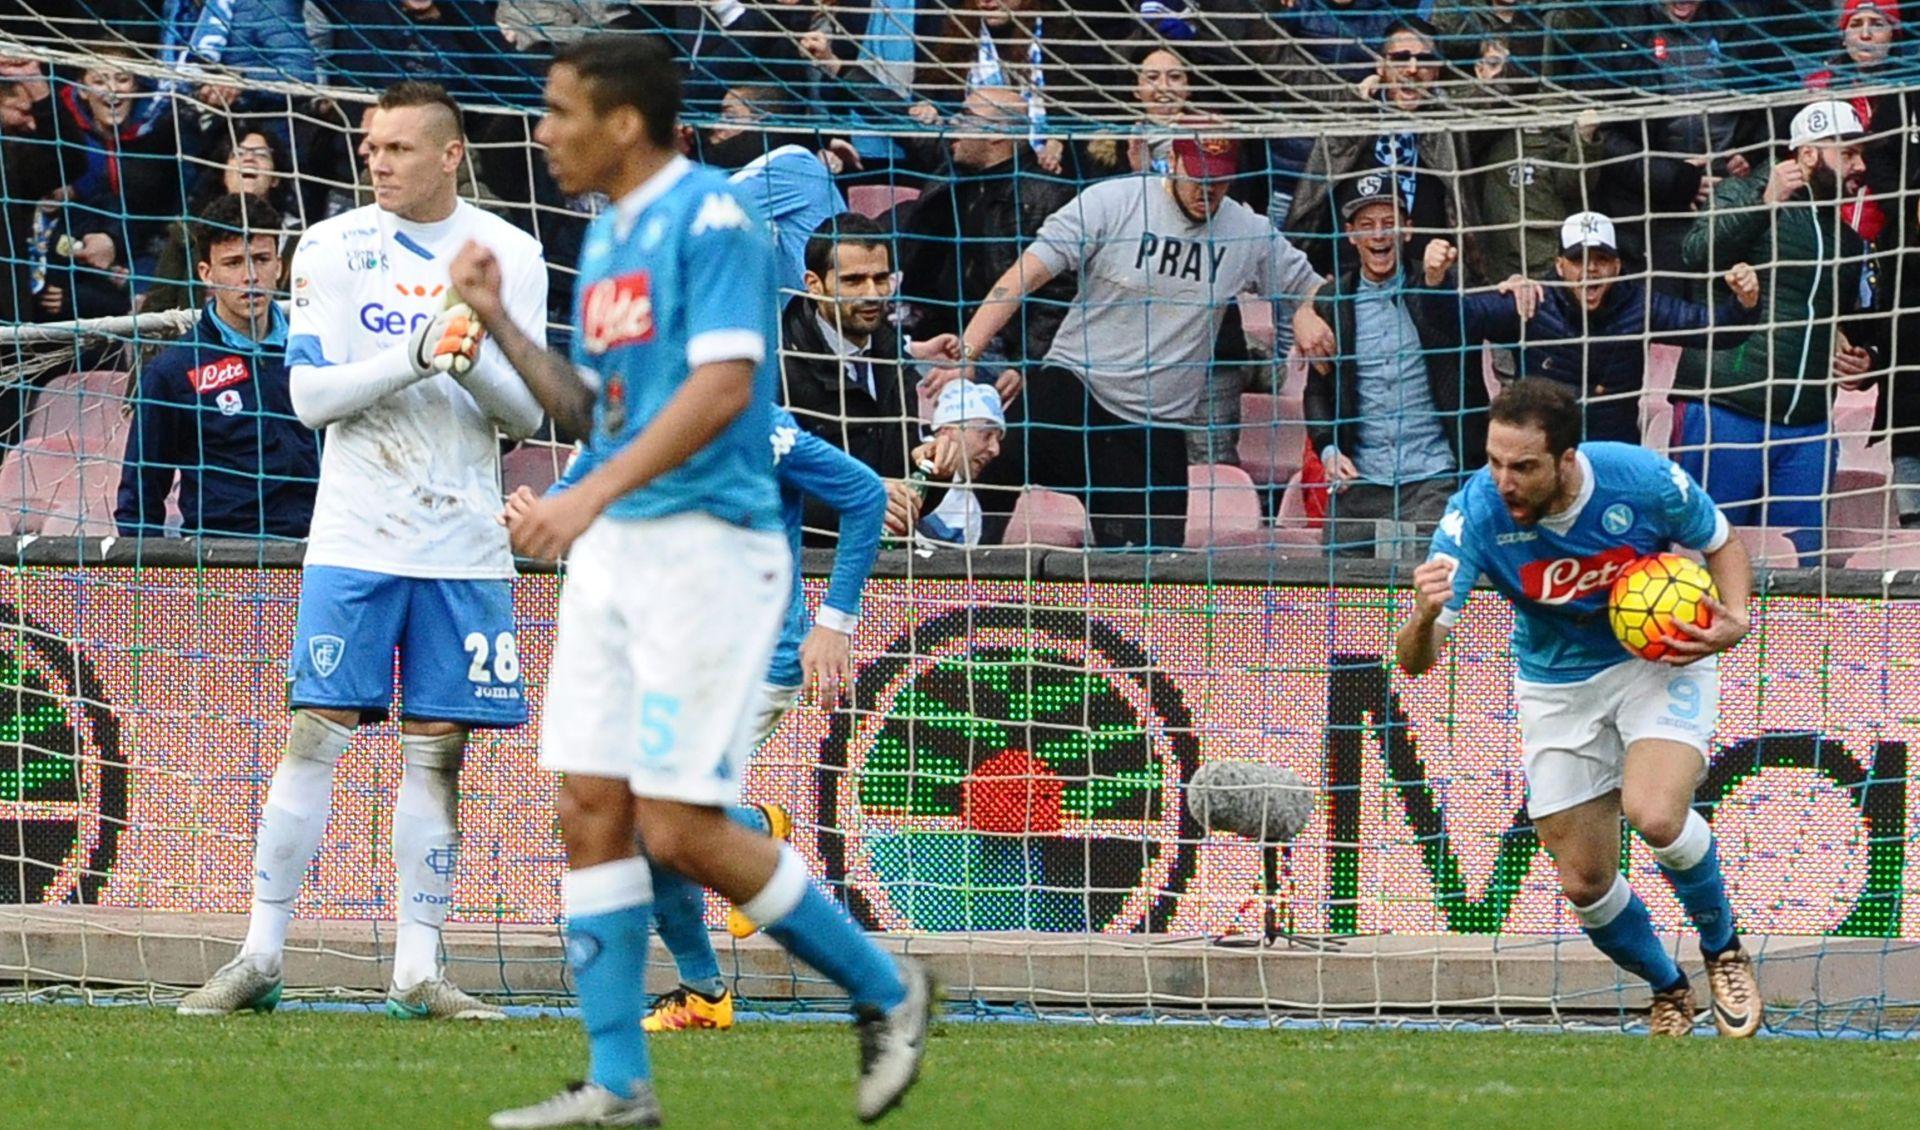 PRVI NA LJESTVICI: Napoli se vratio na vrh